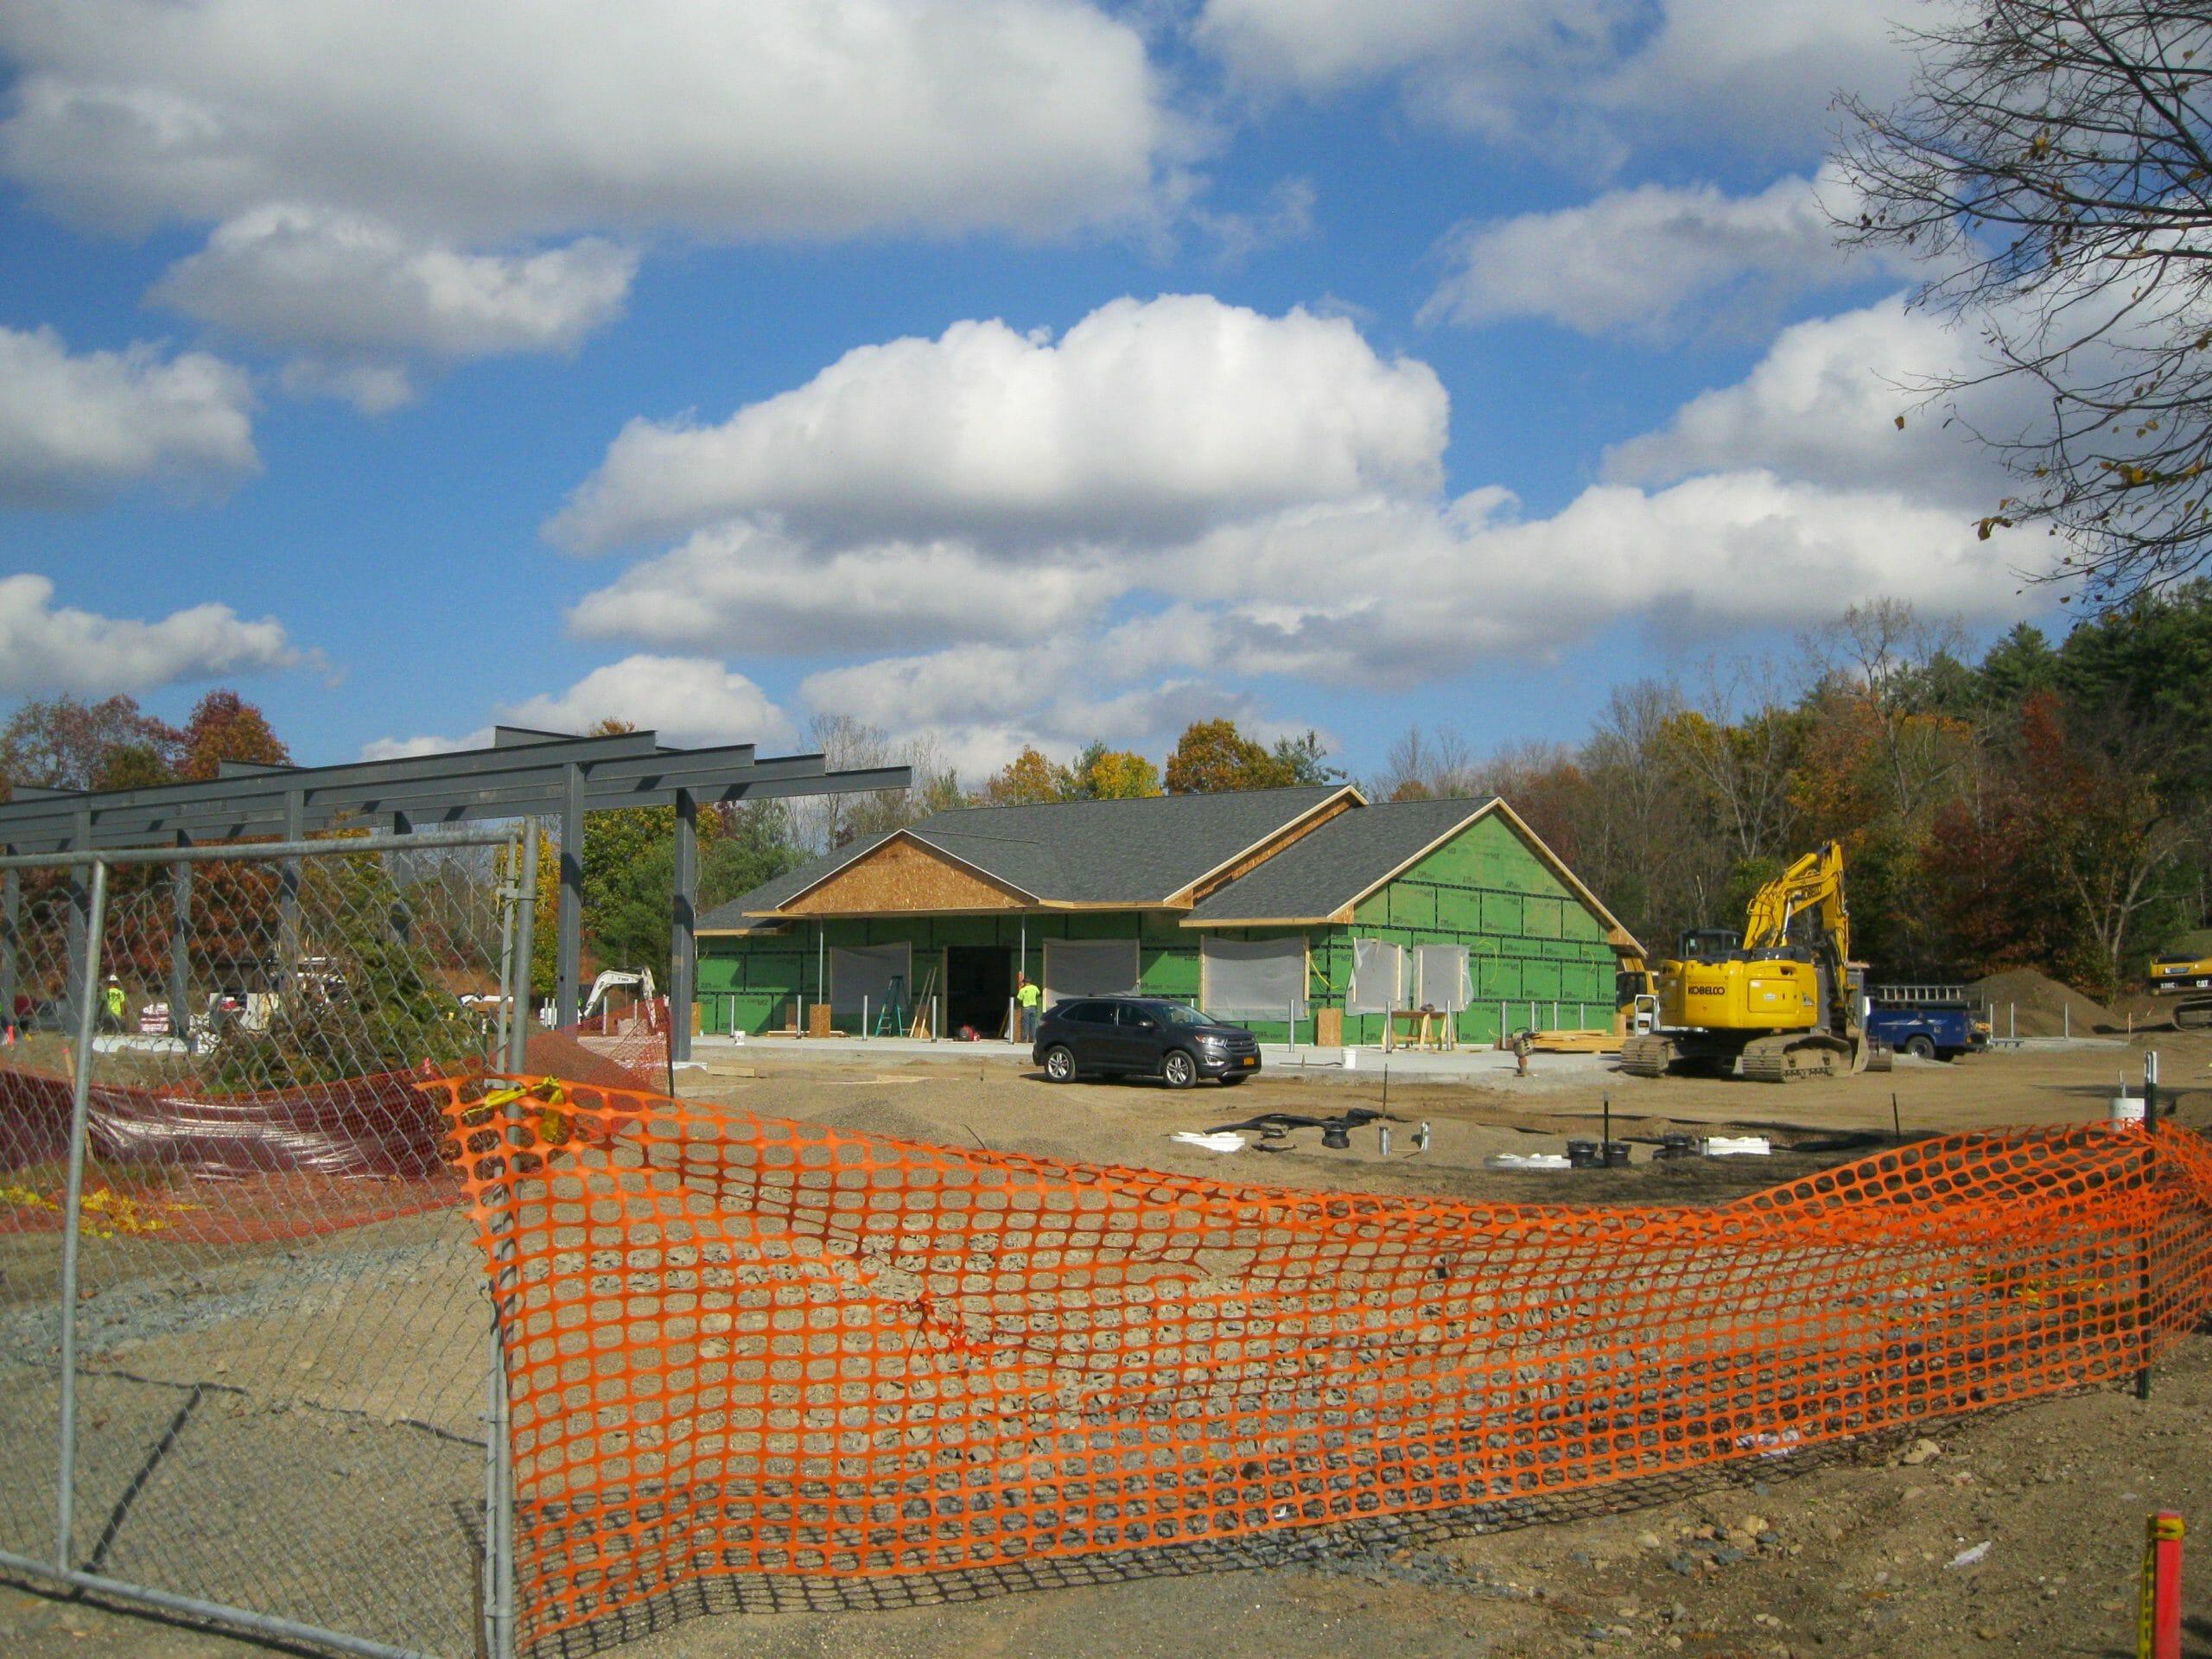 Castleton Shop Exterior being built